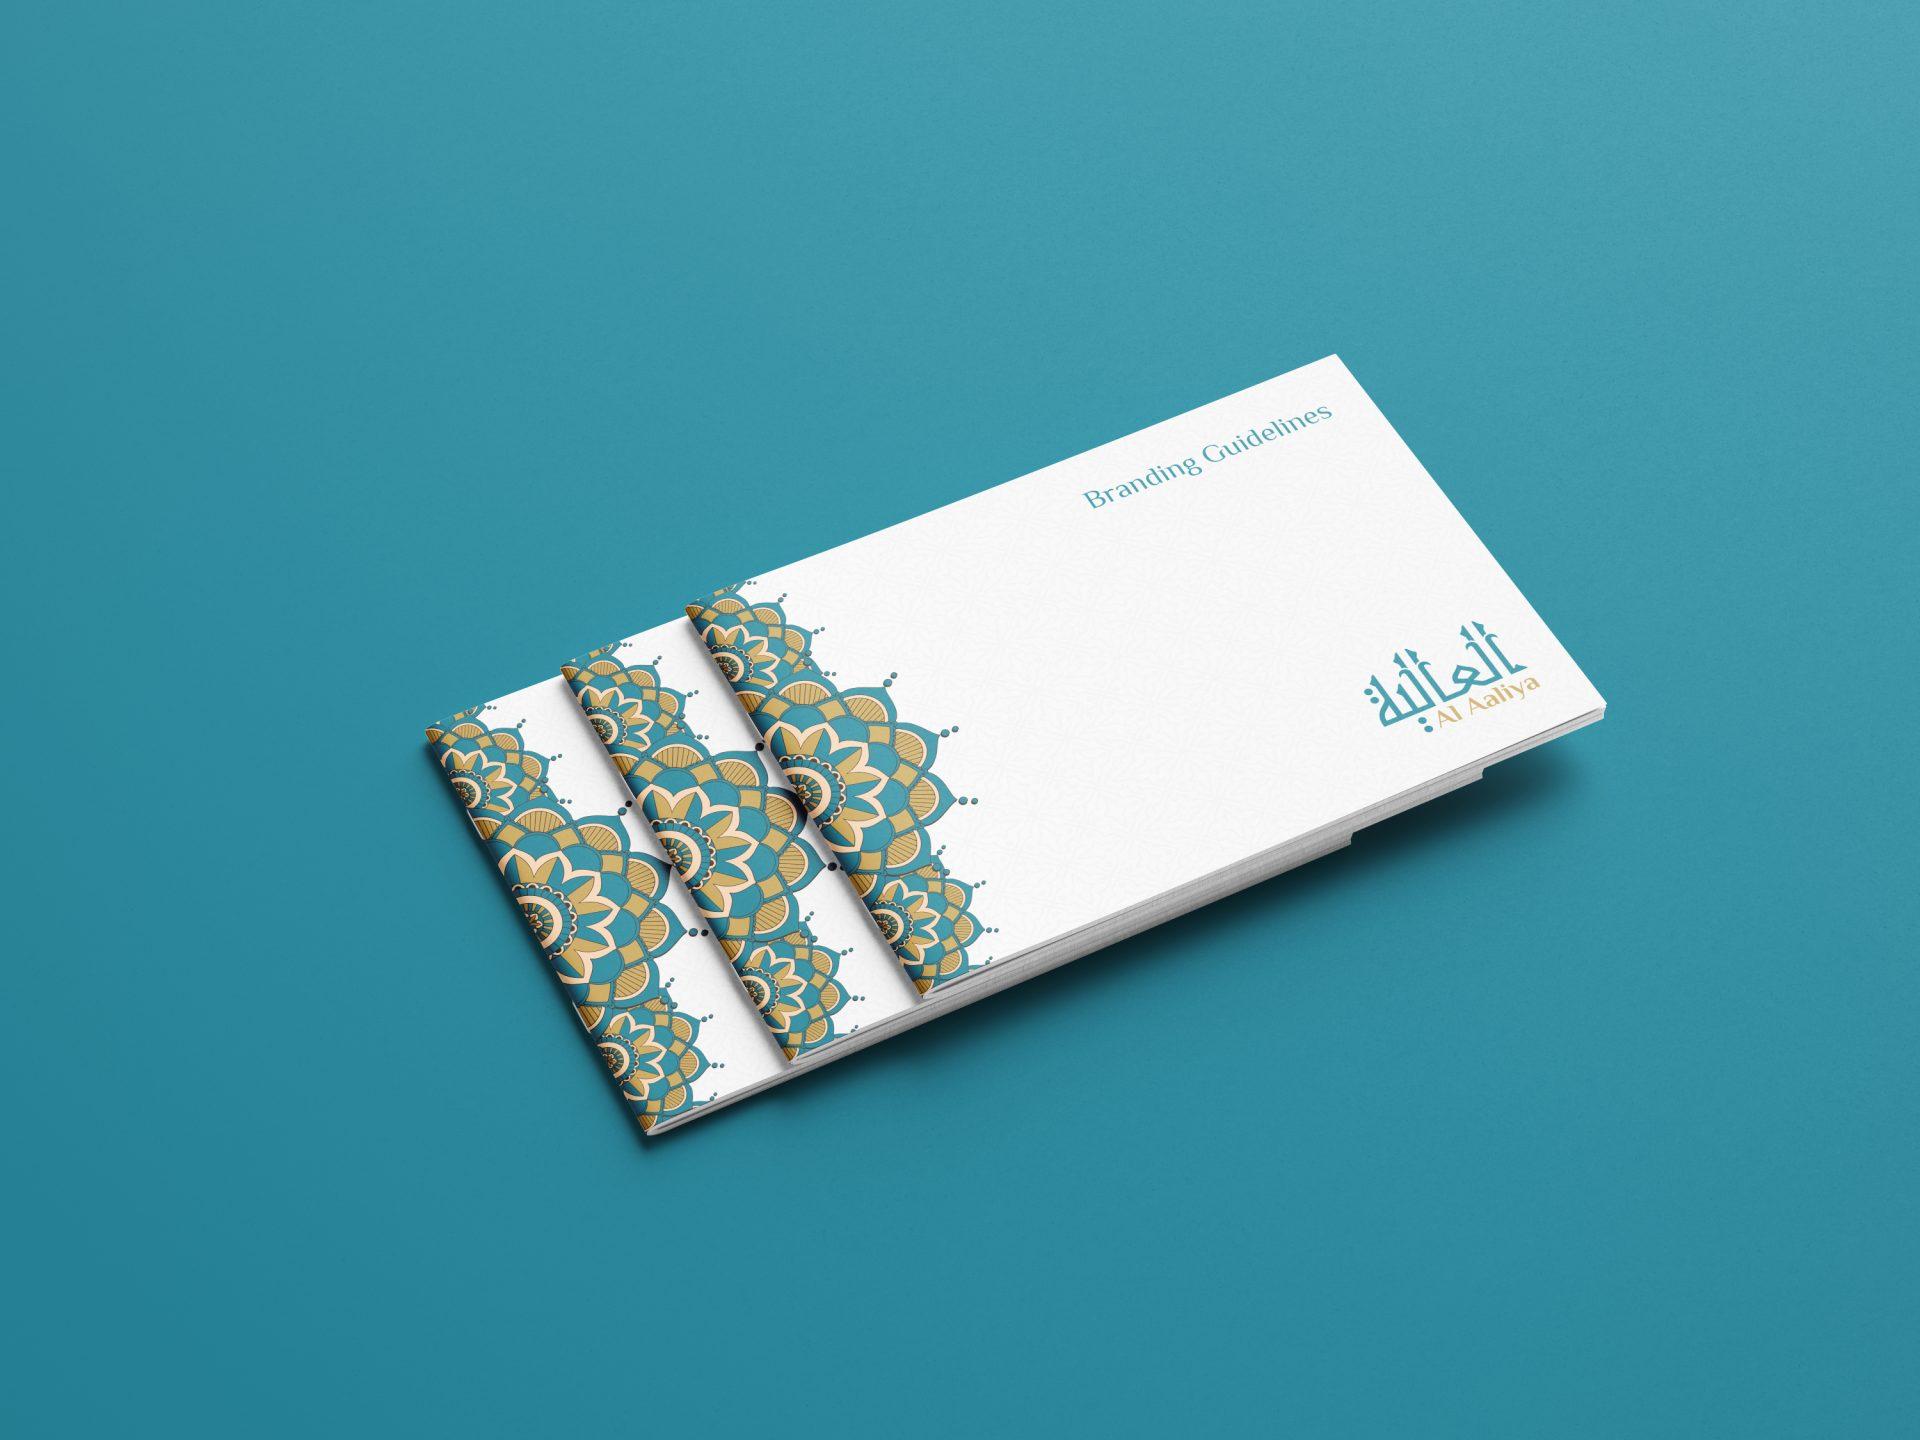 Al Aaliya Branding